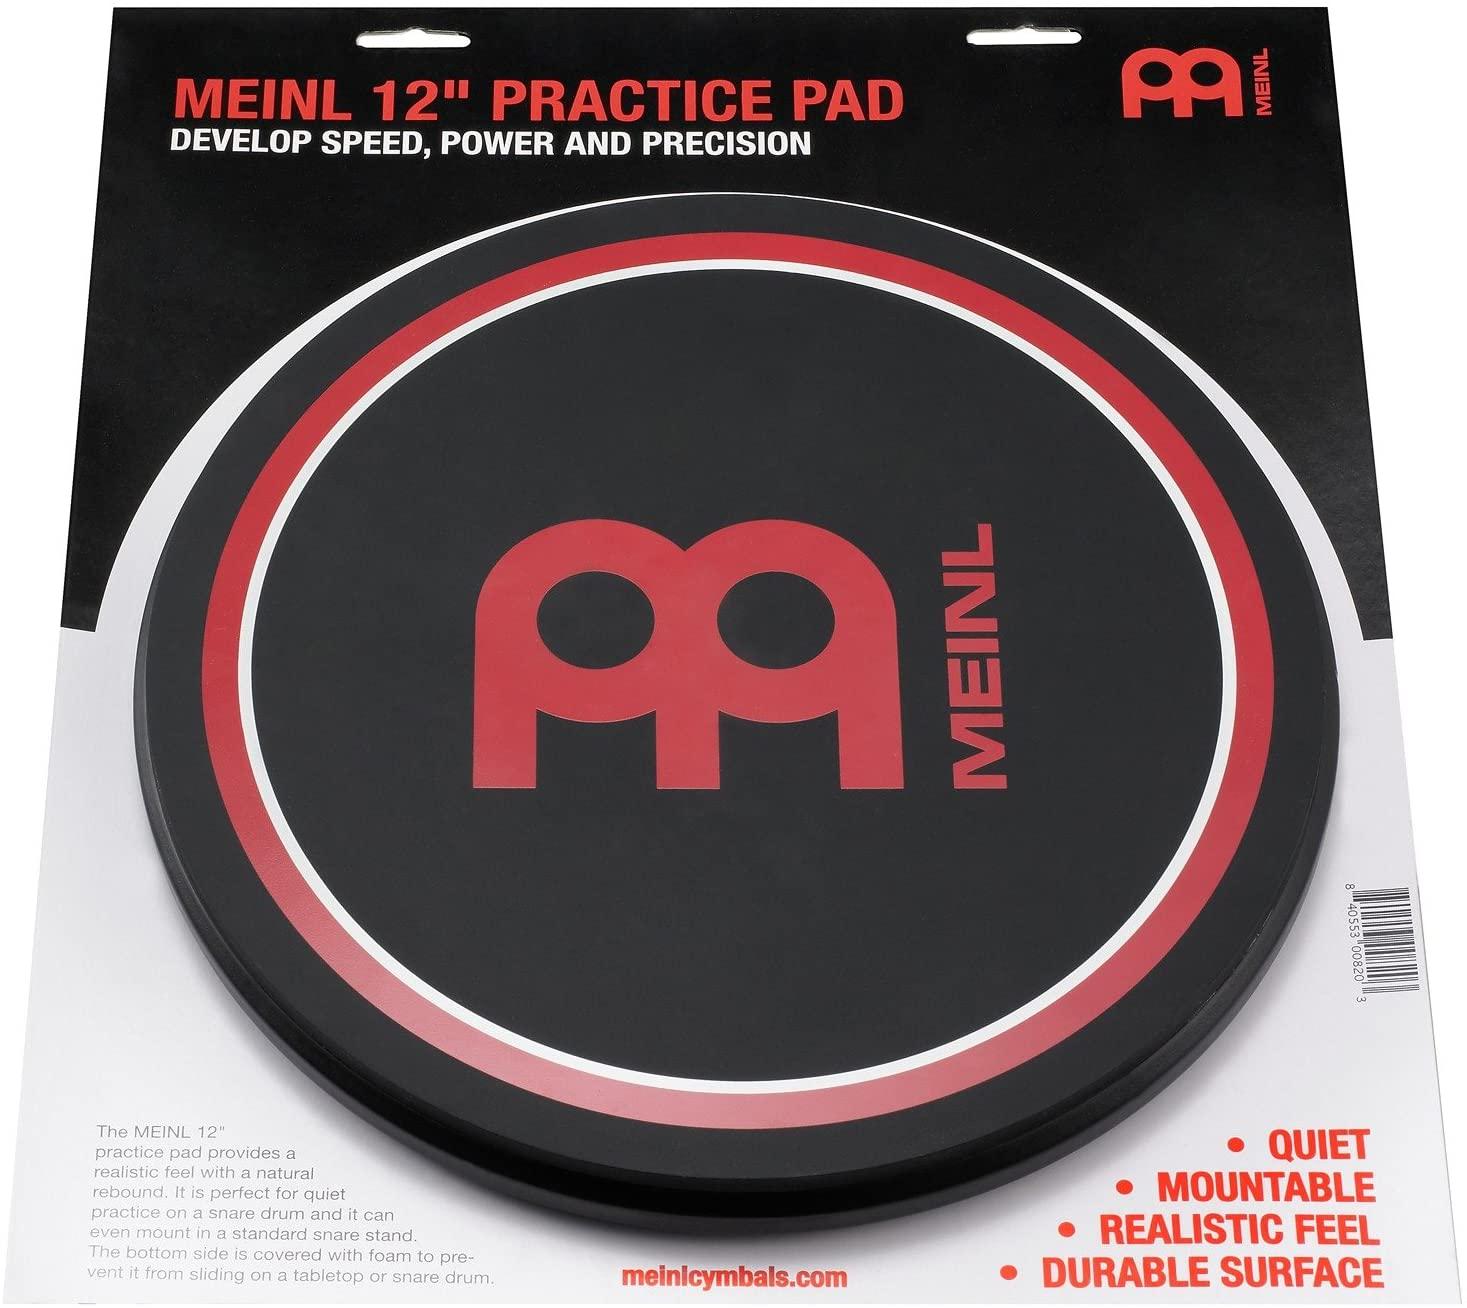 Meinl Cymbals MPP-12 12-Inch Practice Pad